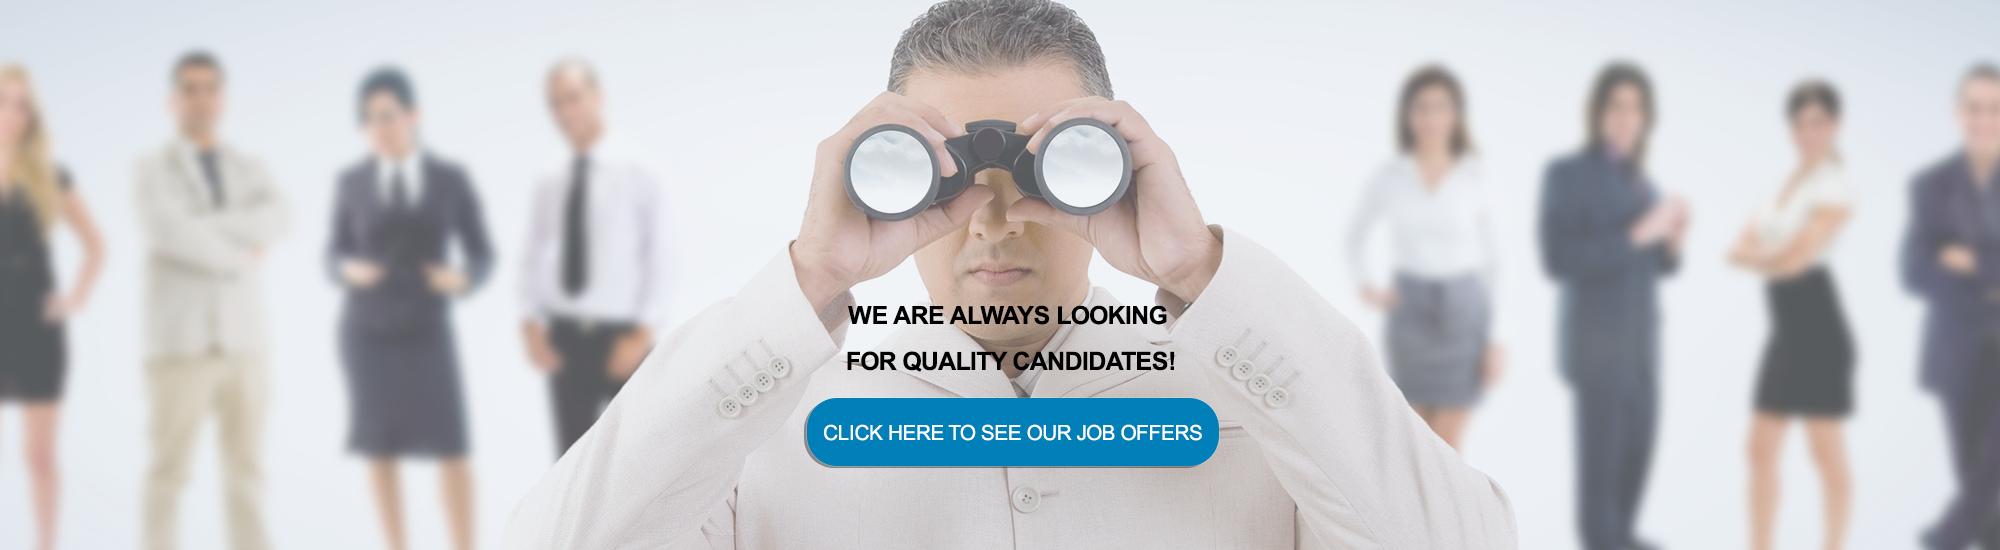 Job Offers - Saint-Jean Hyundai